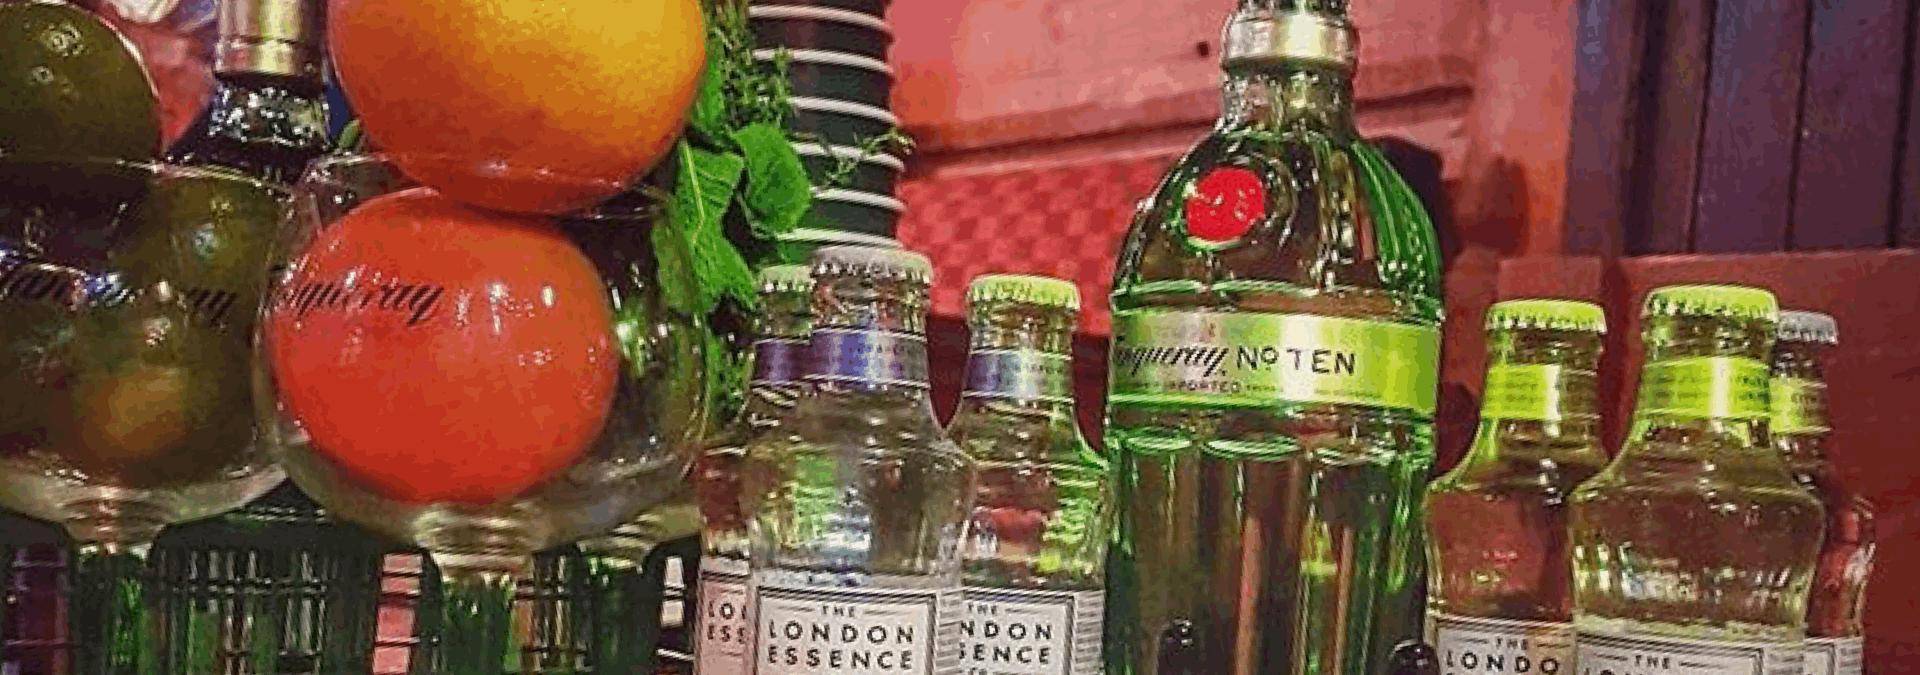 Chlorophyll Cocktail